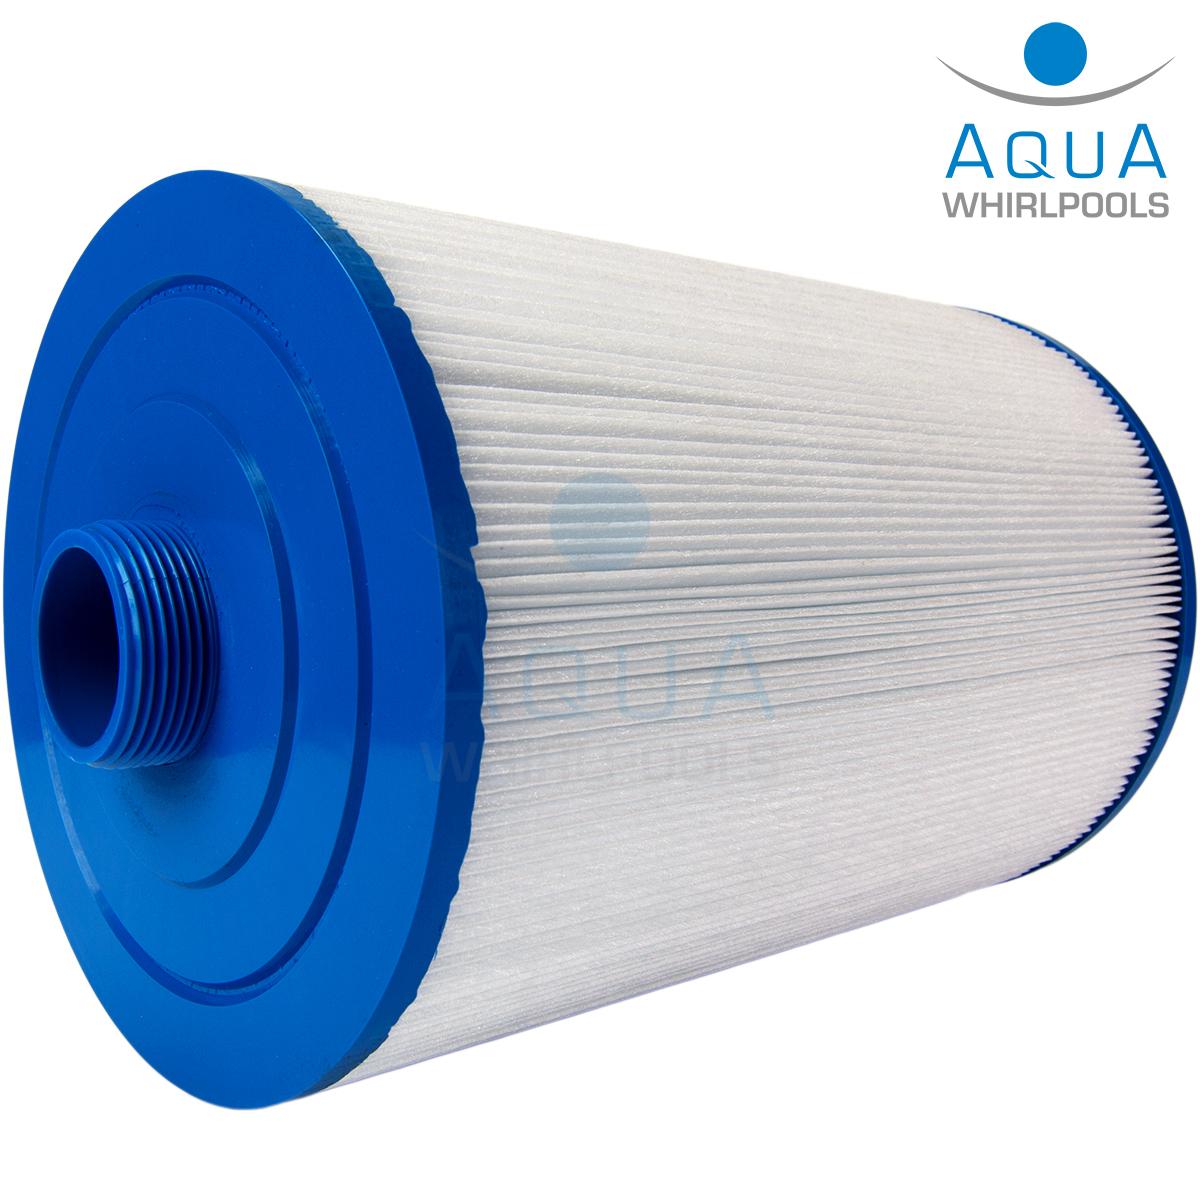 Filter pleatco pvt40 darlly 70402 filter4spas sc710 magnum ch40 - Aqua whirlpools ...